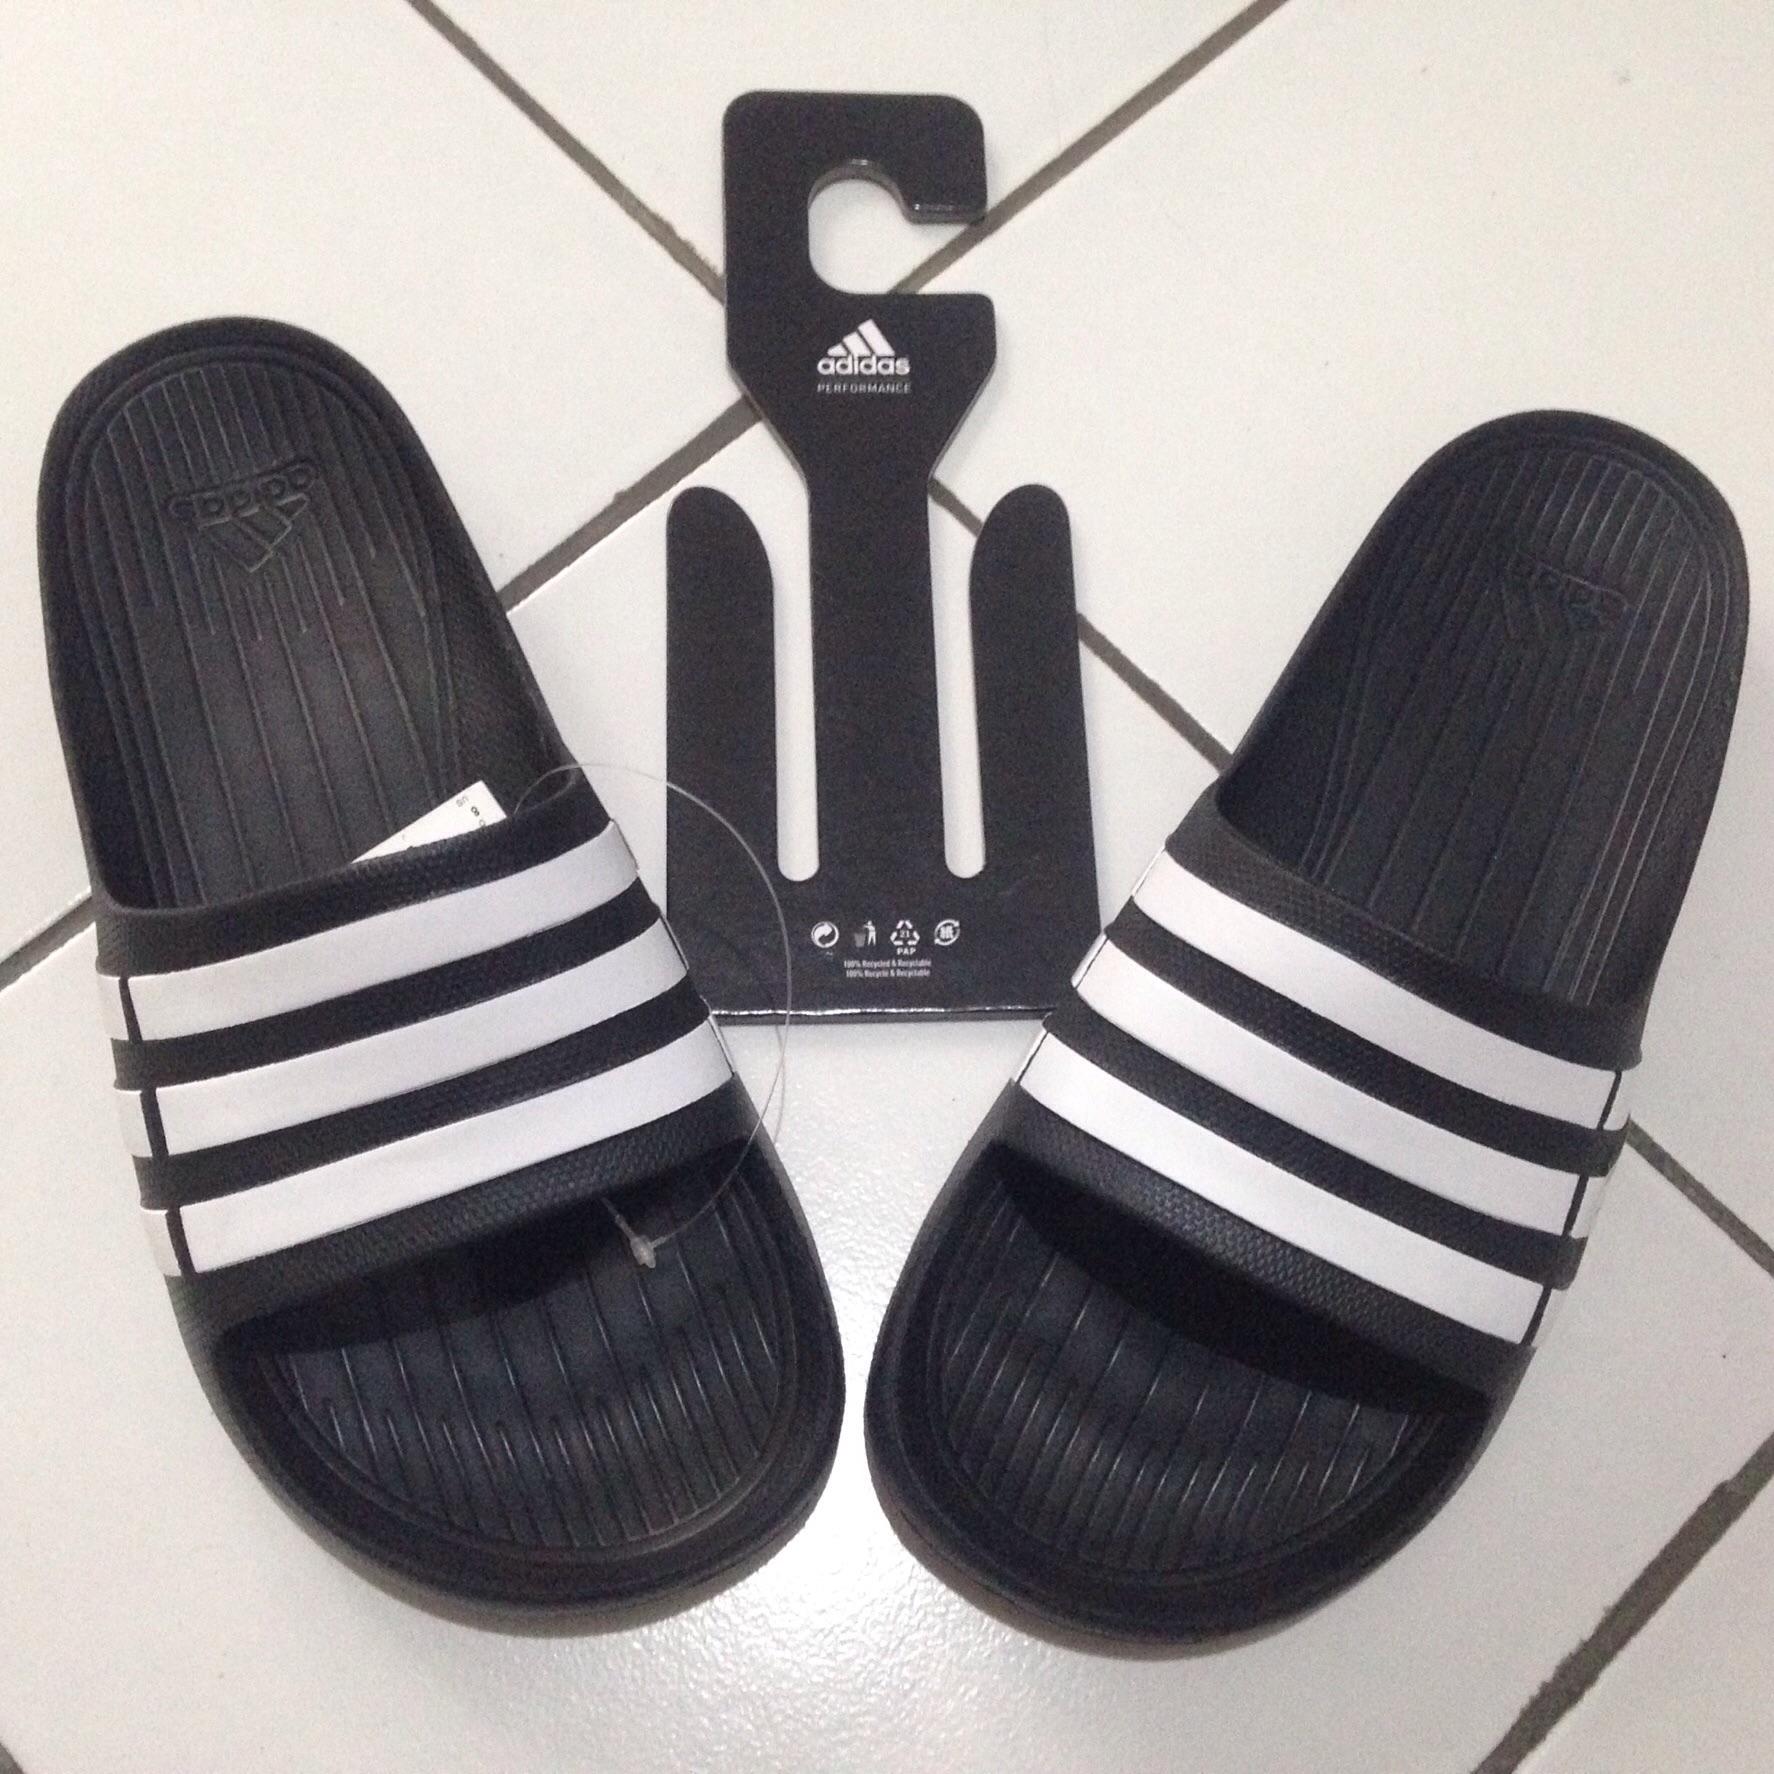 Terjual Adidas Sendal Pria Amp Wanita Adissage Voloomix